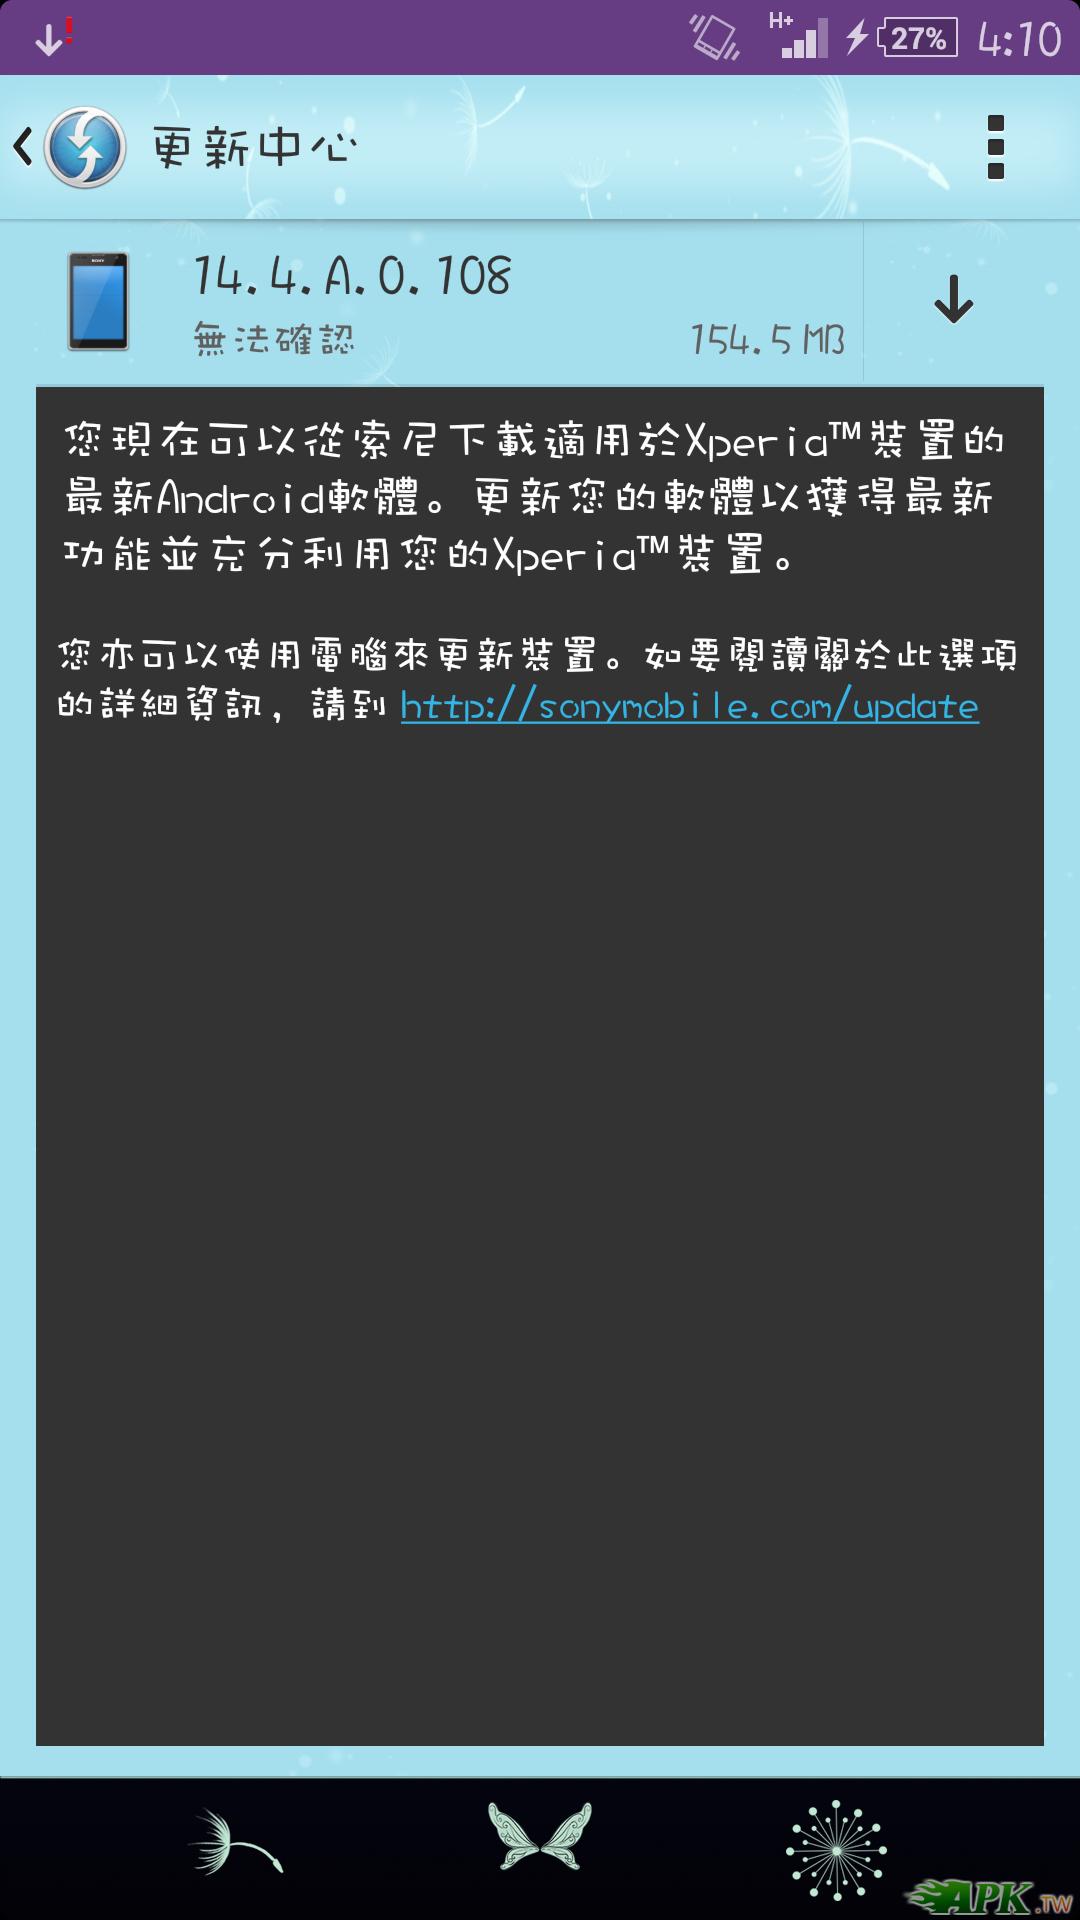 Screenshot_2014-07-04-04-10-13.png